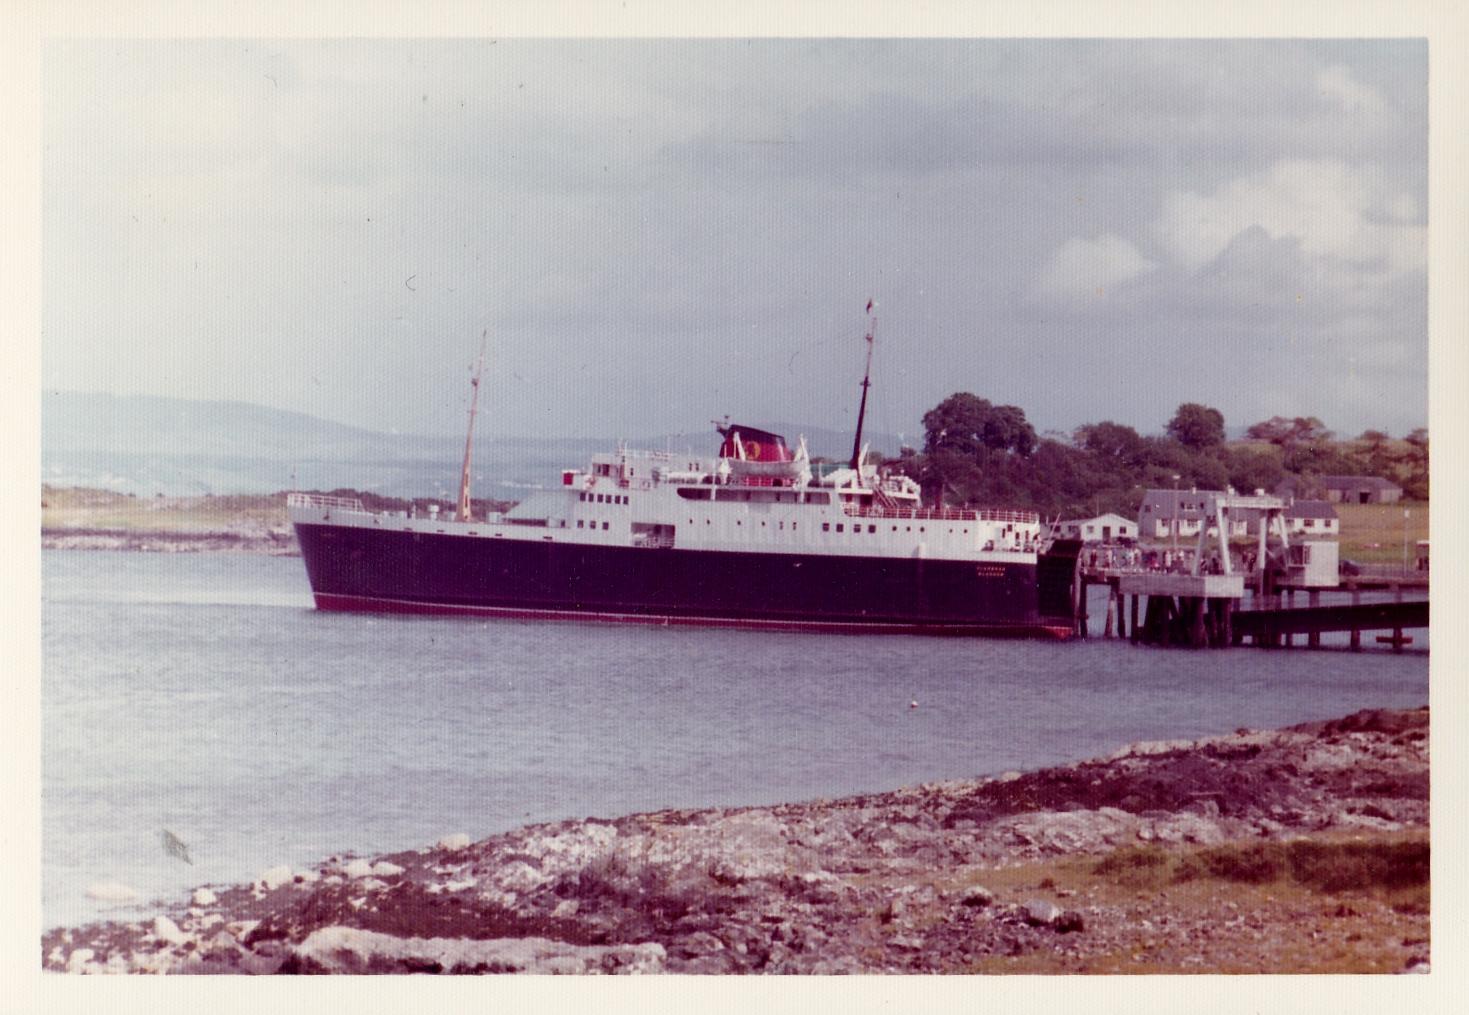 Clansman stern-loading at Craignure (Jim Aikman Smith)